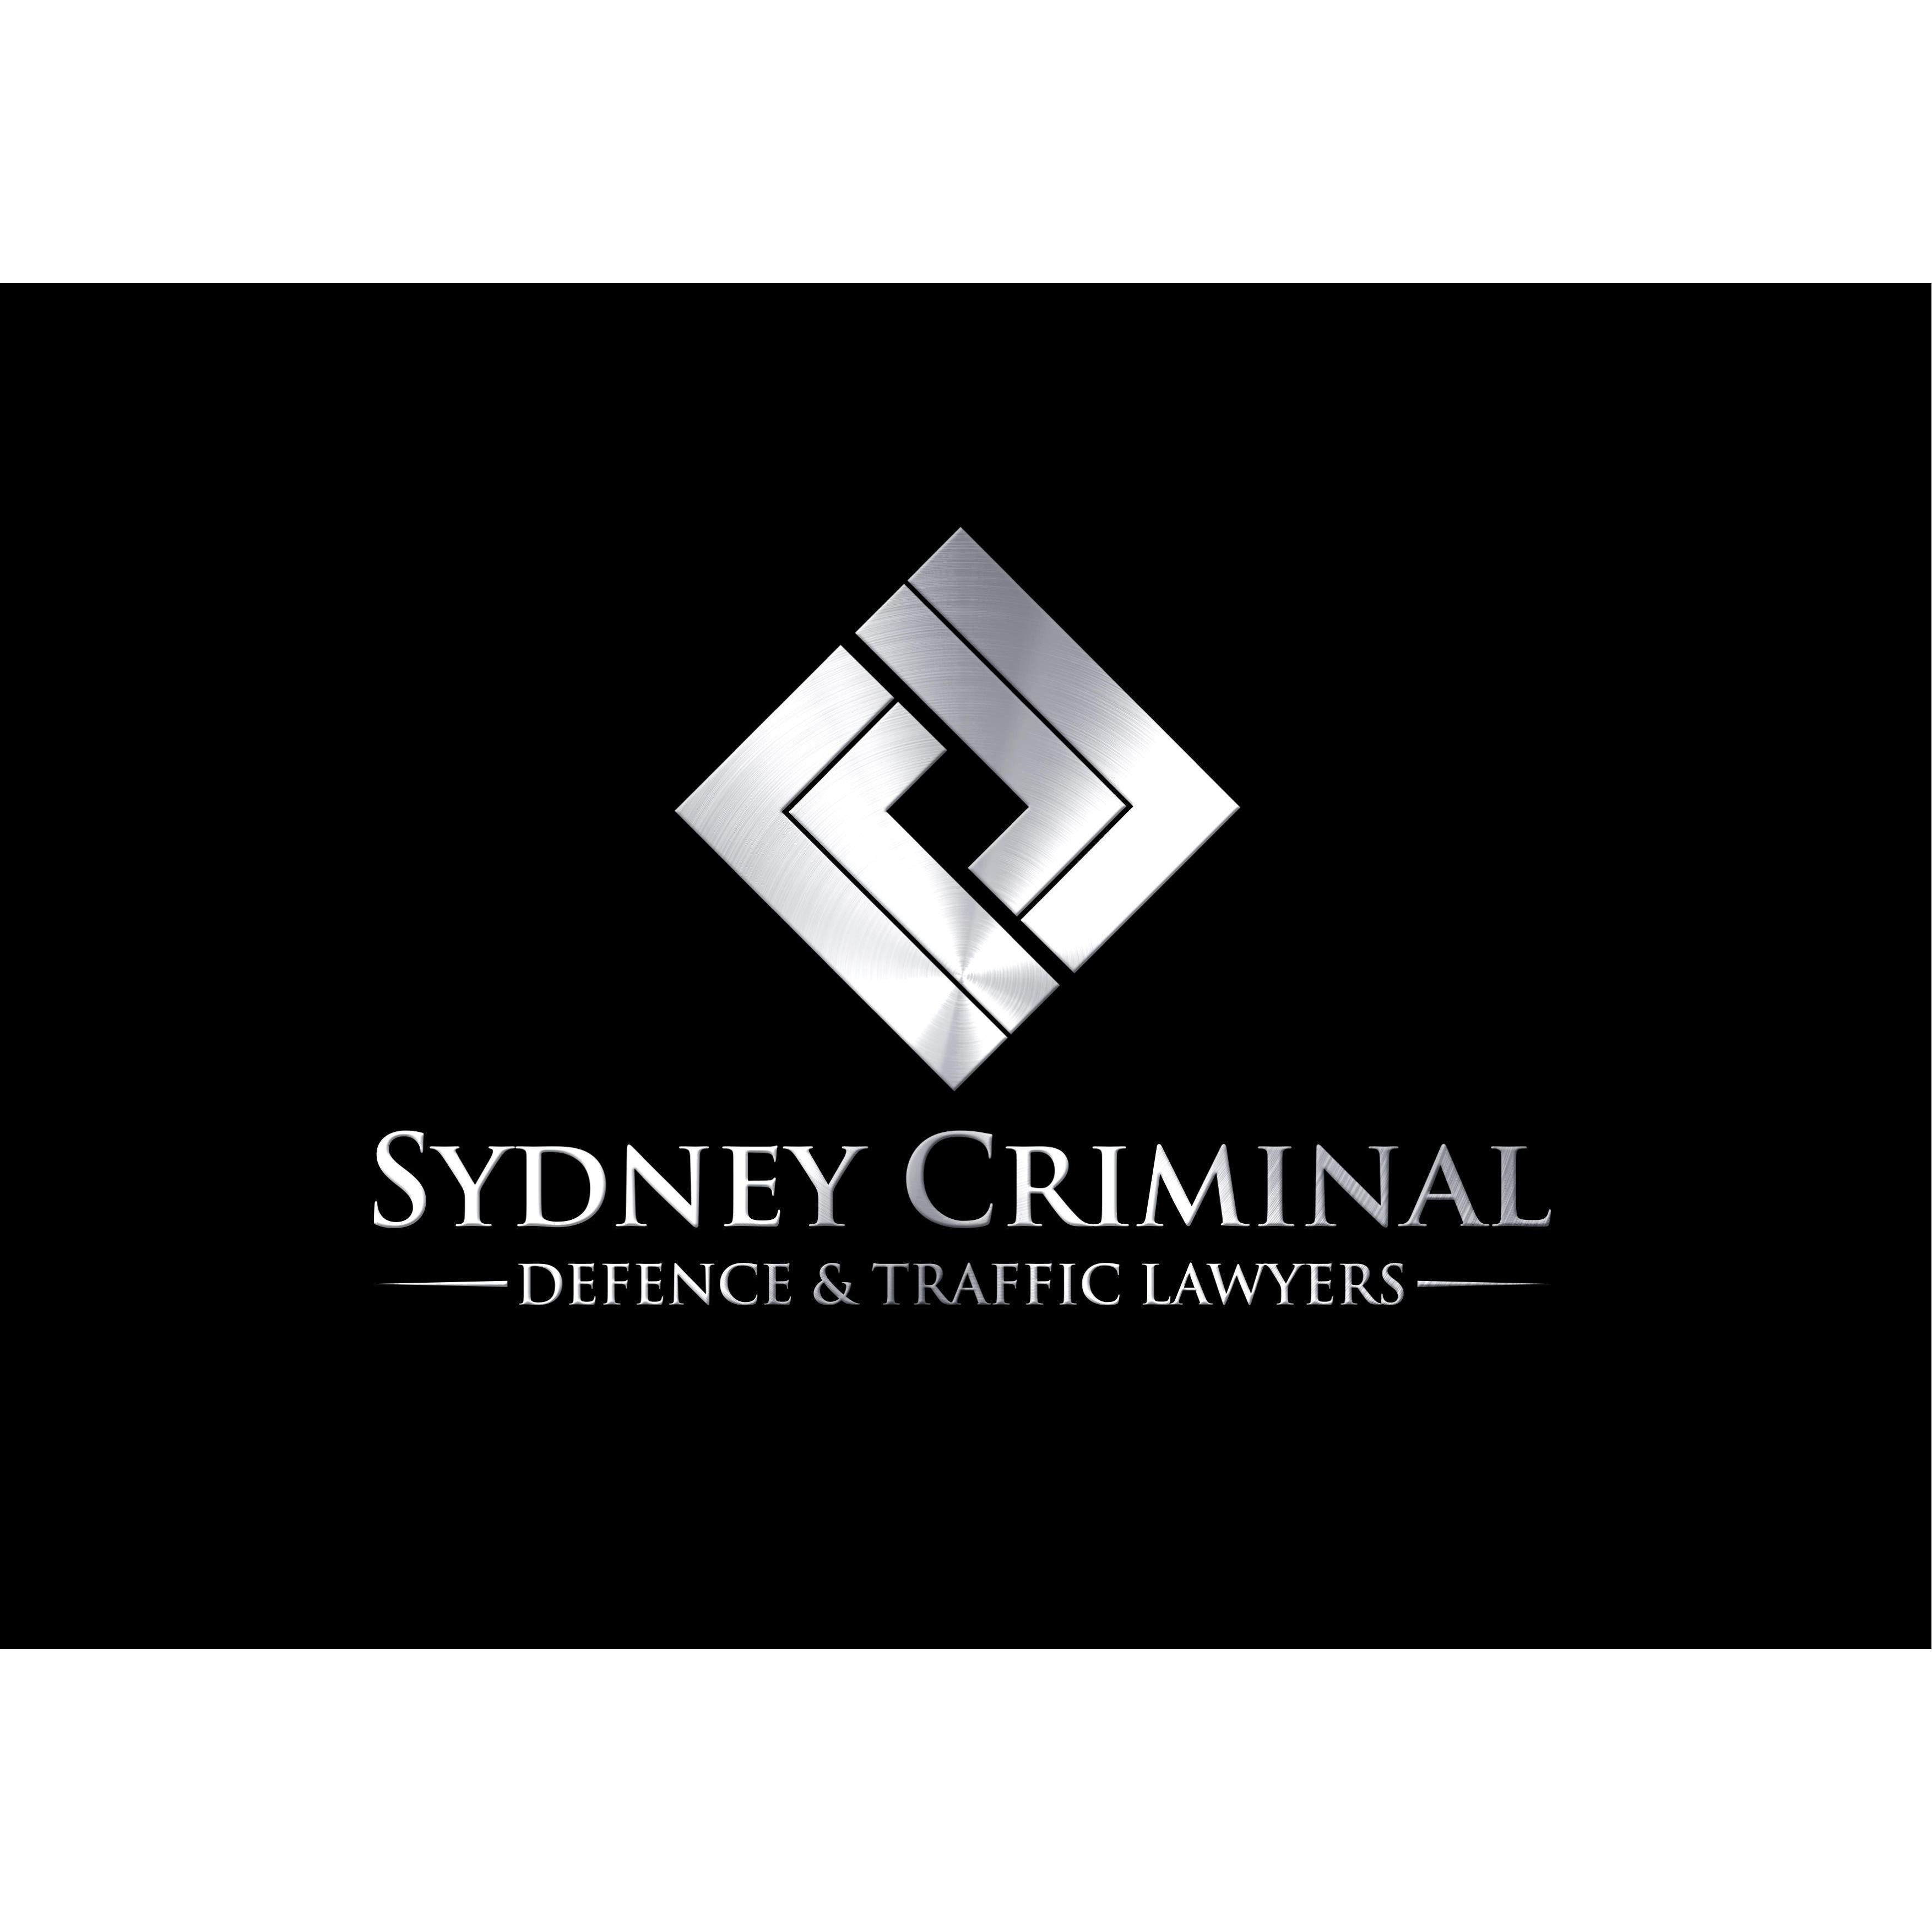 Sydney Criminal Defence & Traffic Lawyers - Sydney, NSW 2000 - 0420 998 650   ShowMeLocal.com